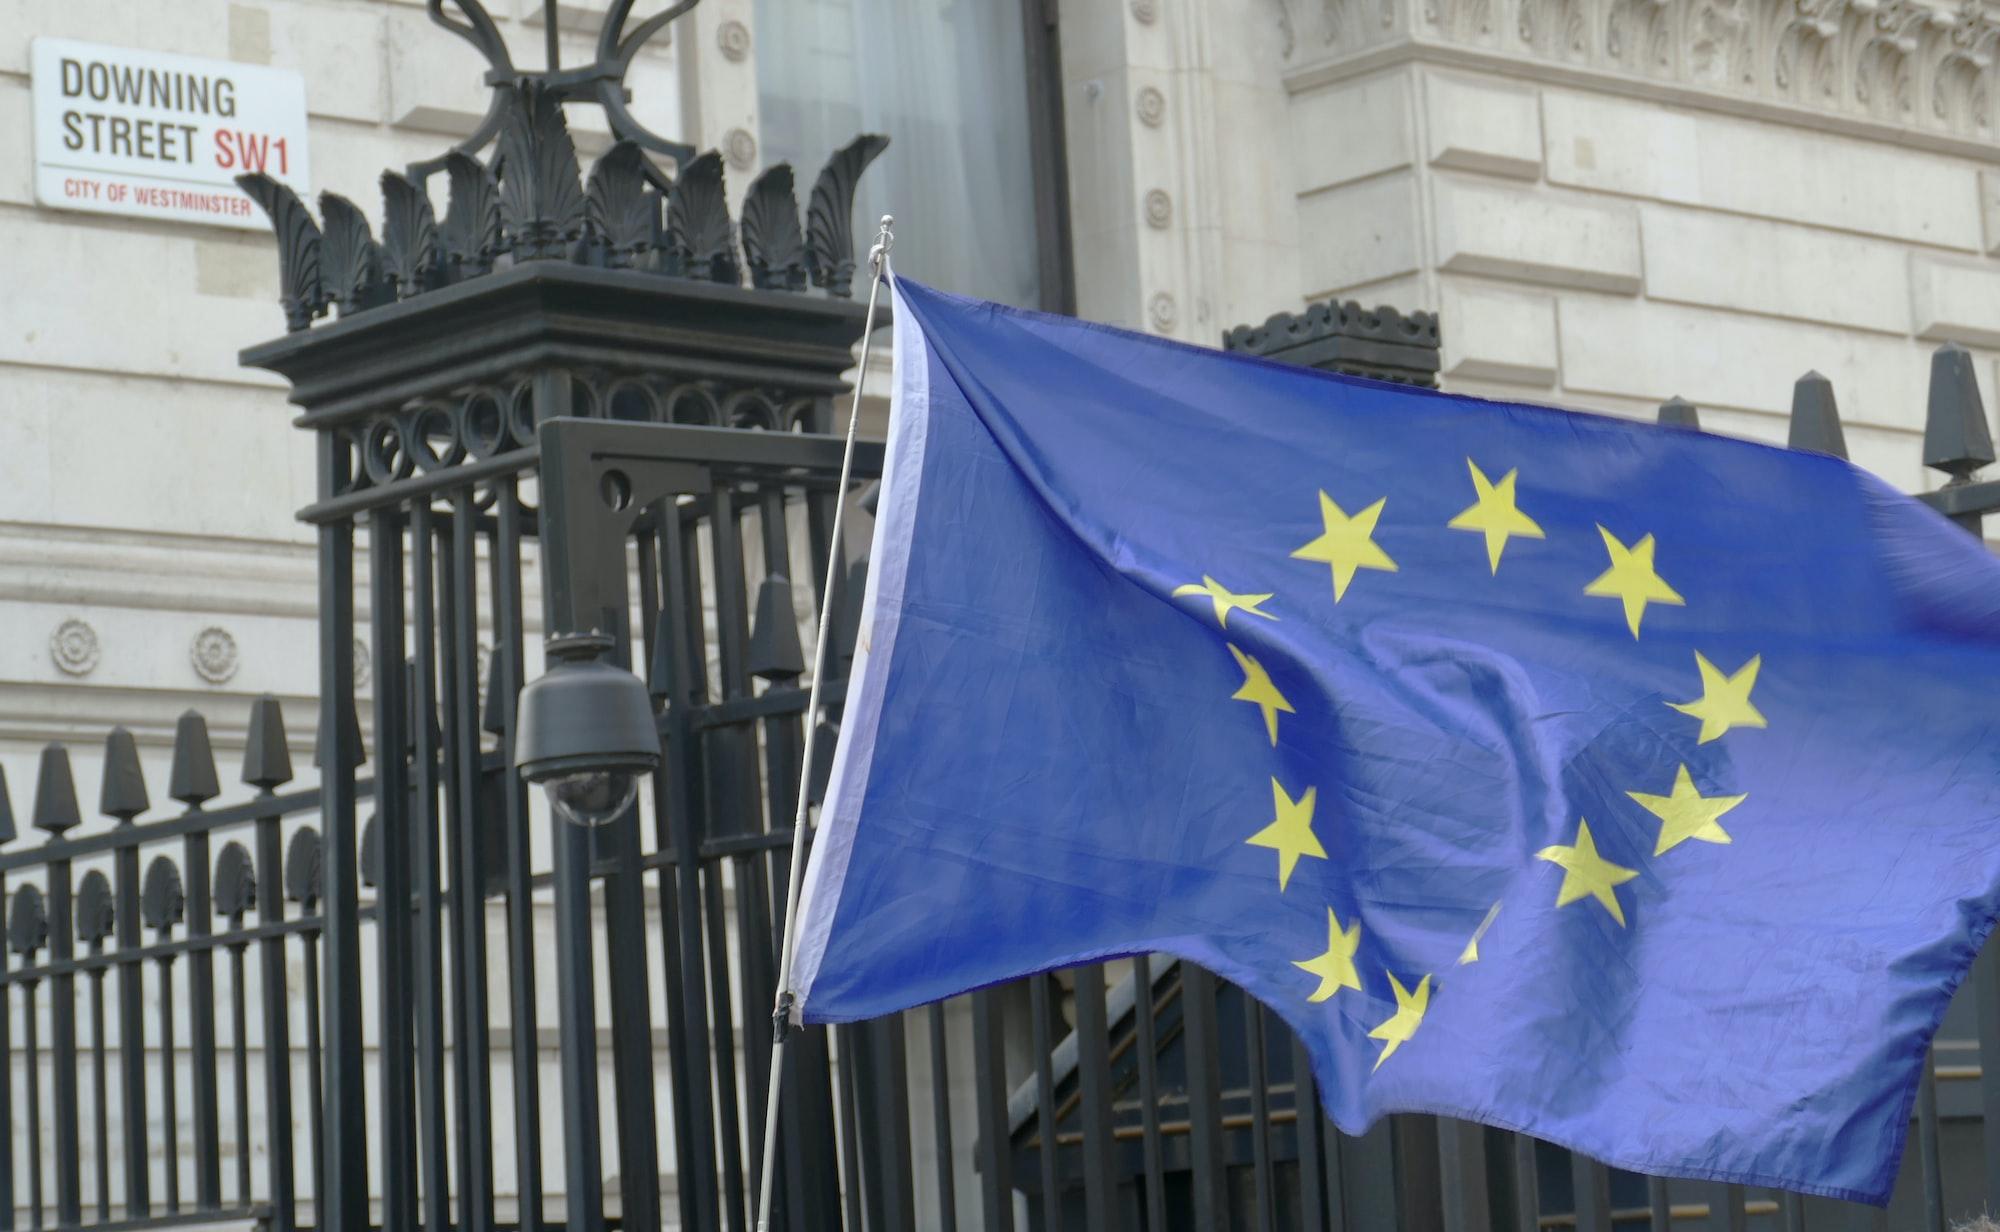 European flag at Downing Street